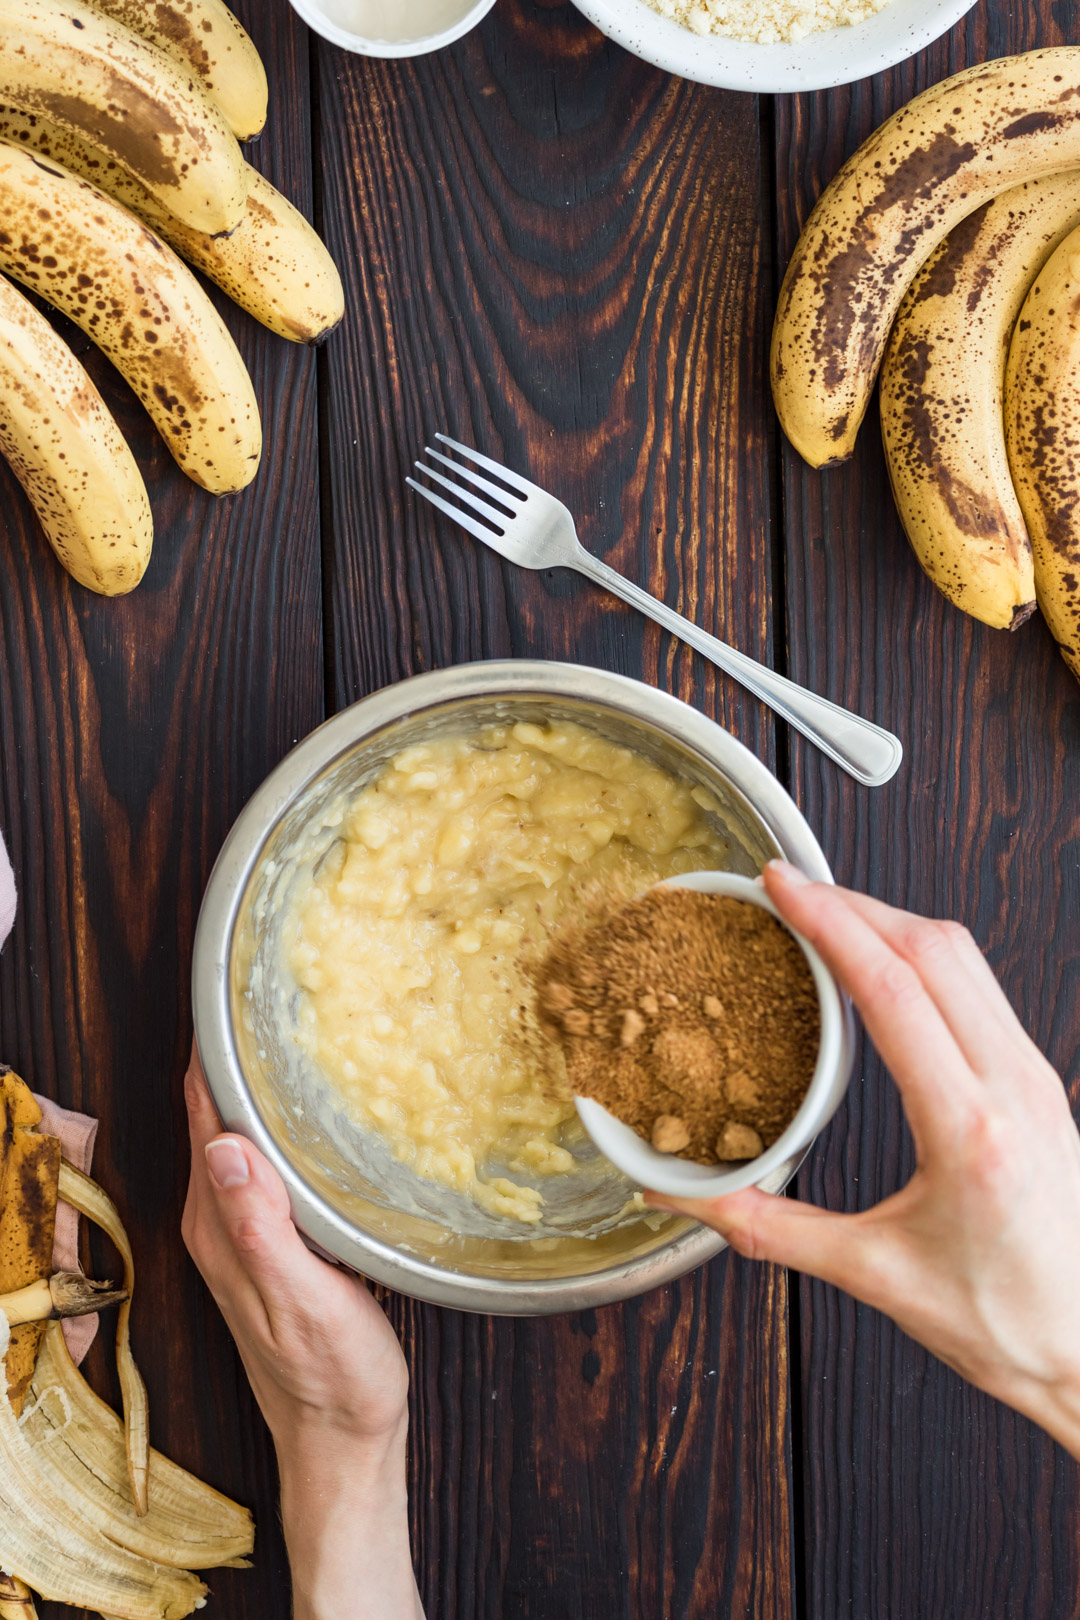 Gluten-free Banana Tart